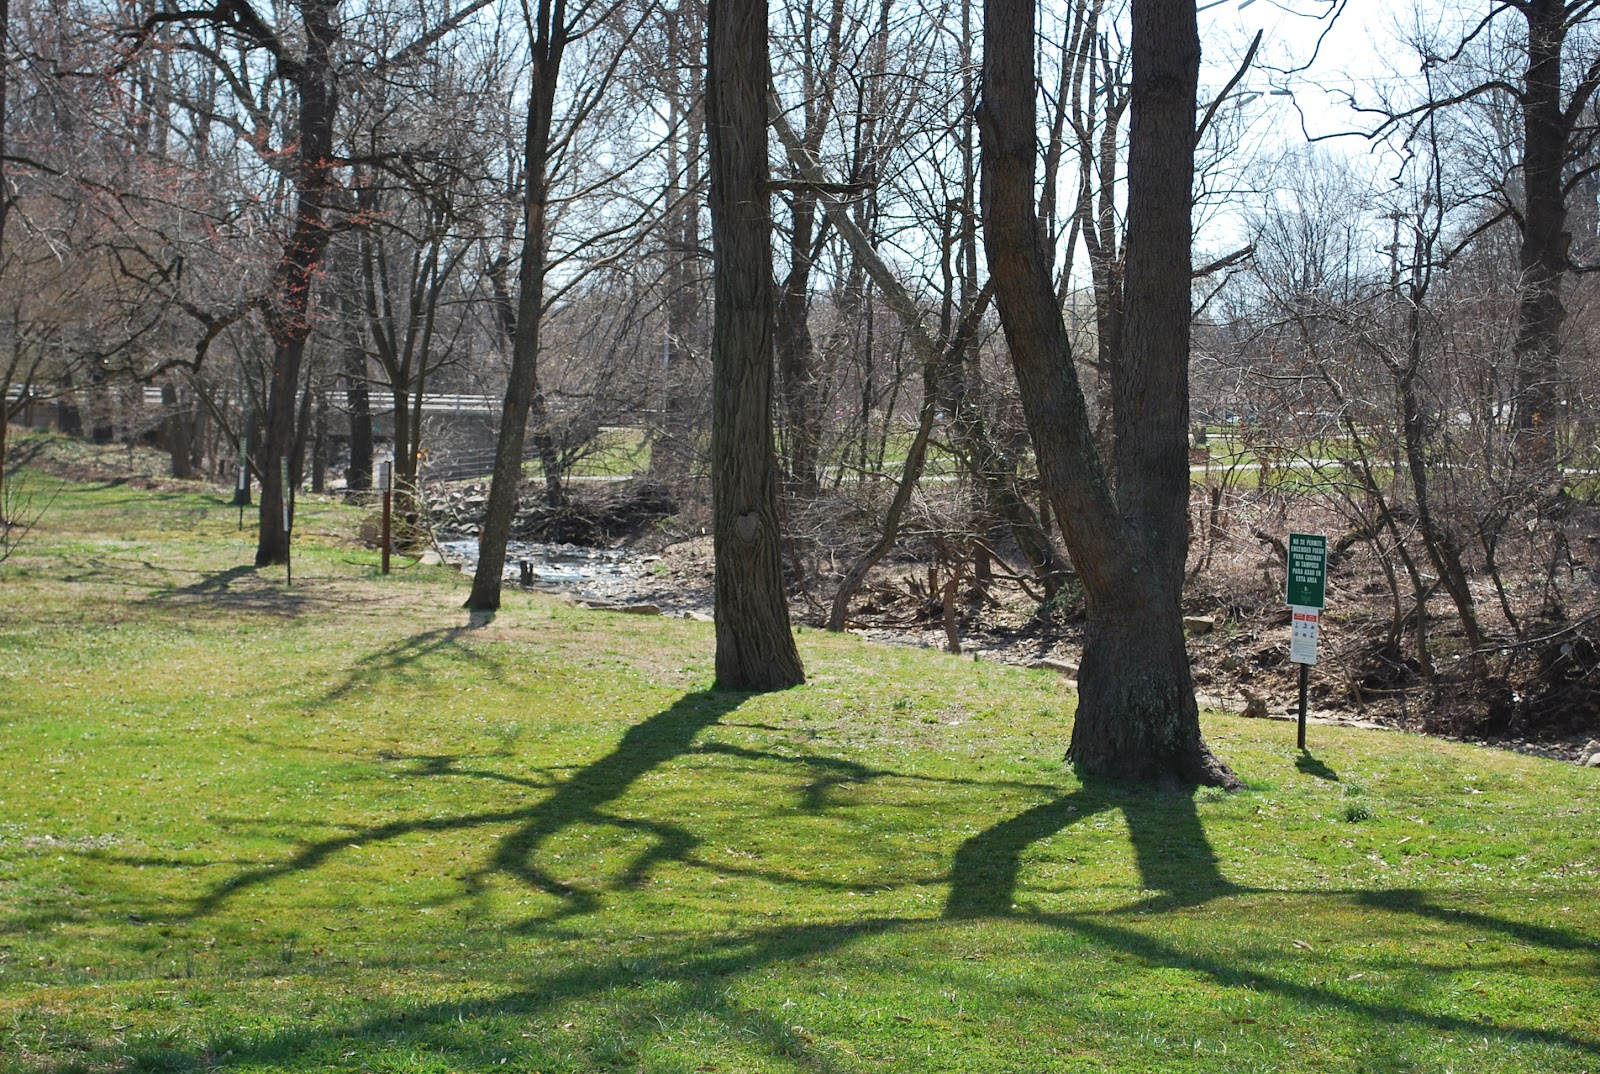 Quarry Shade Garden At Bon Air Park: The Next Best Thing.....: Bon Air Park In Arlington, VA